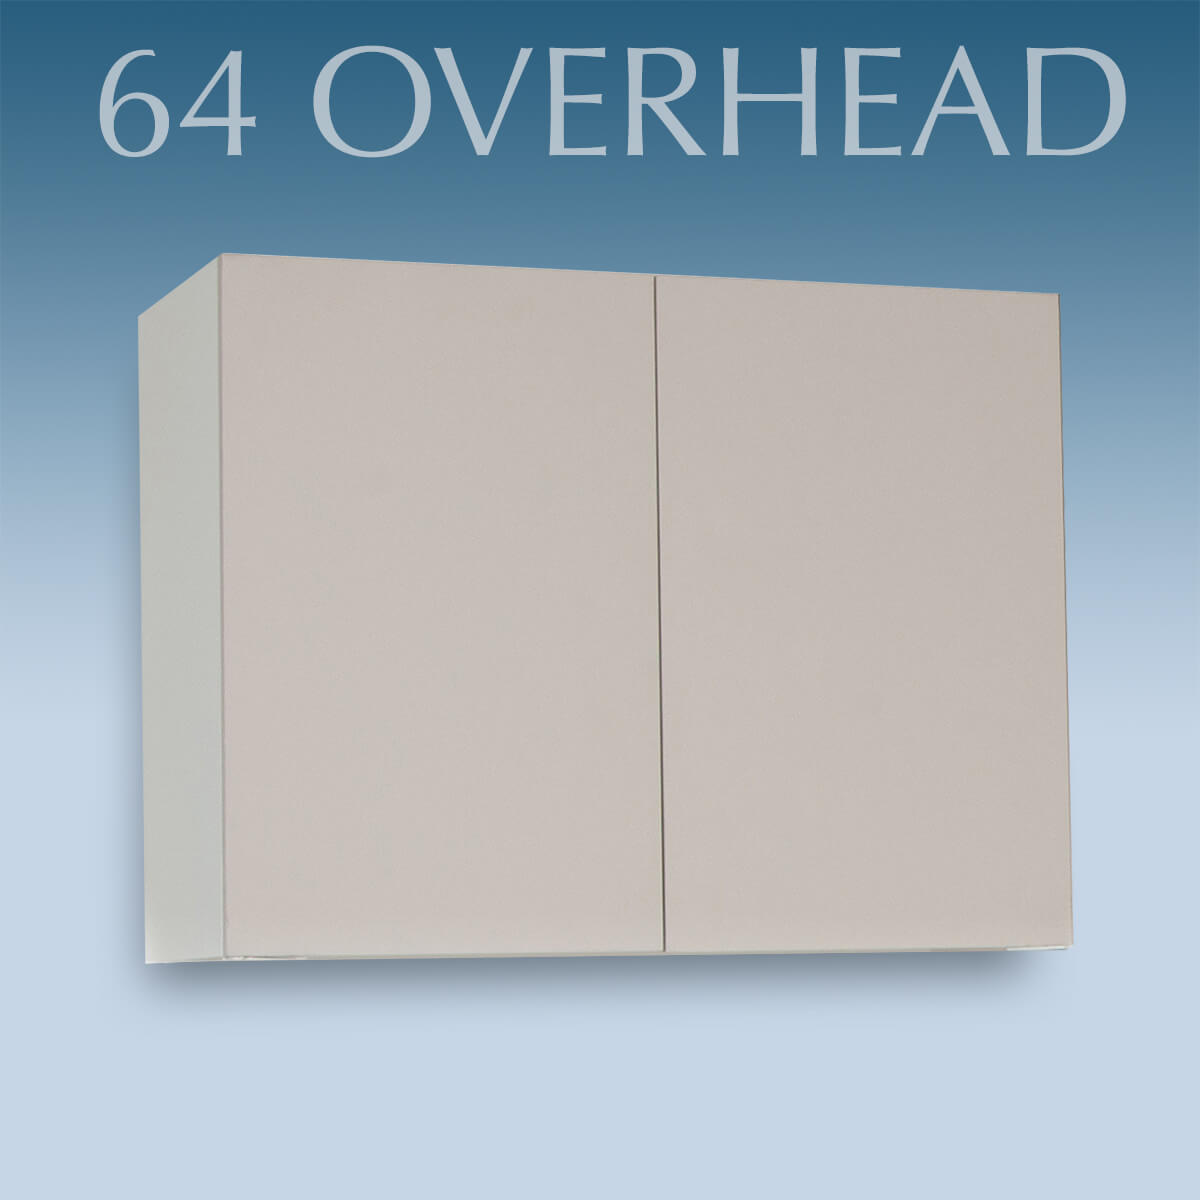 64-Overhead.jpg